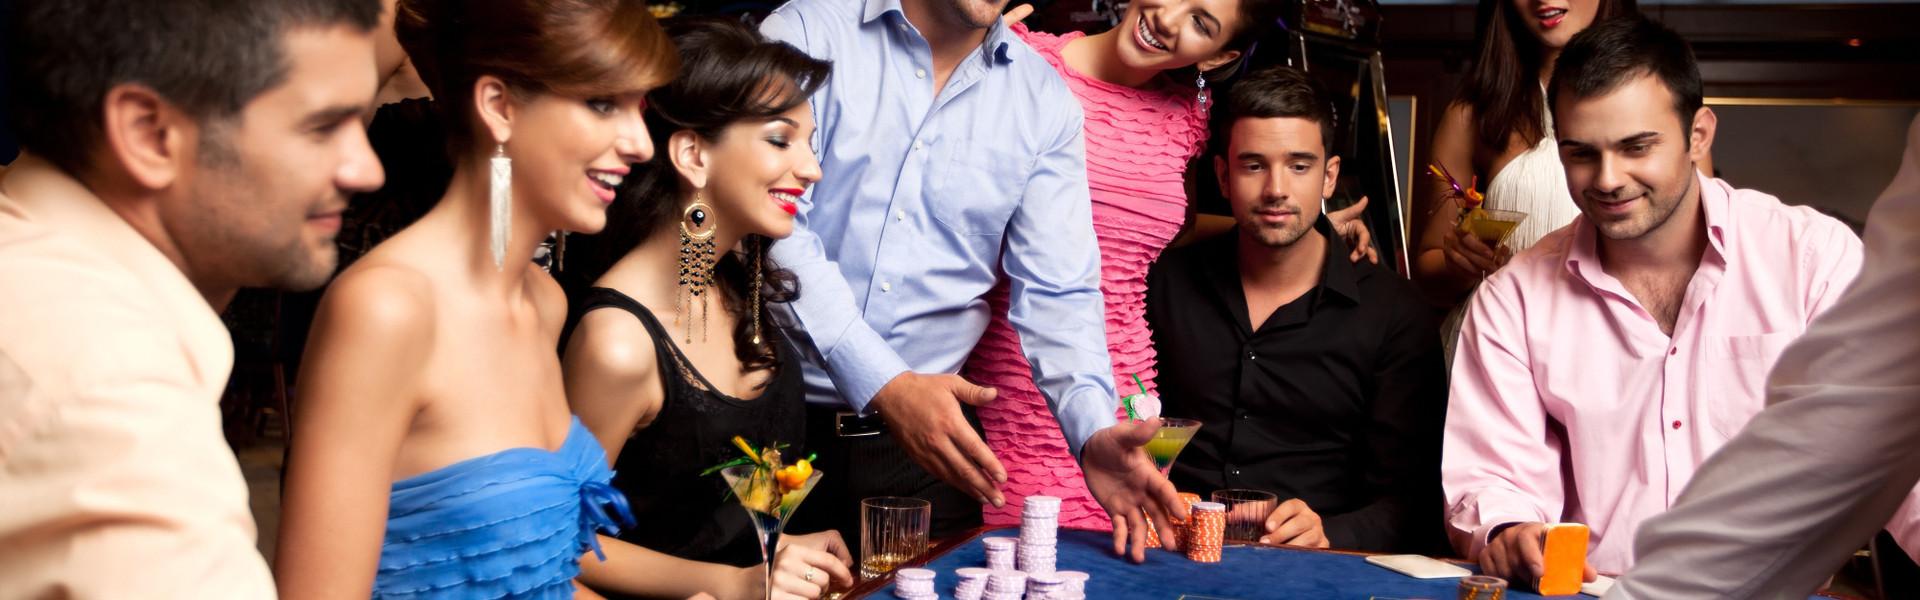 The best selection of table games in Las Vegas NV | Westgate Las Vegas Resort & Casino